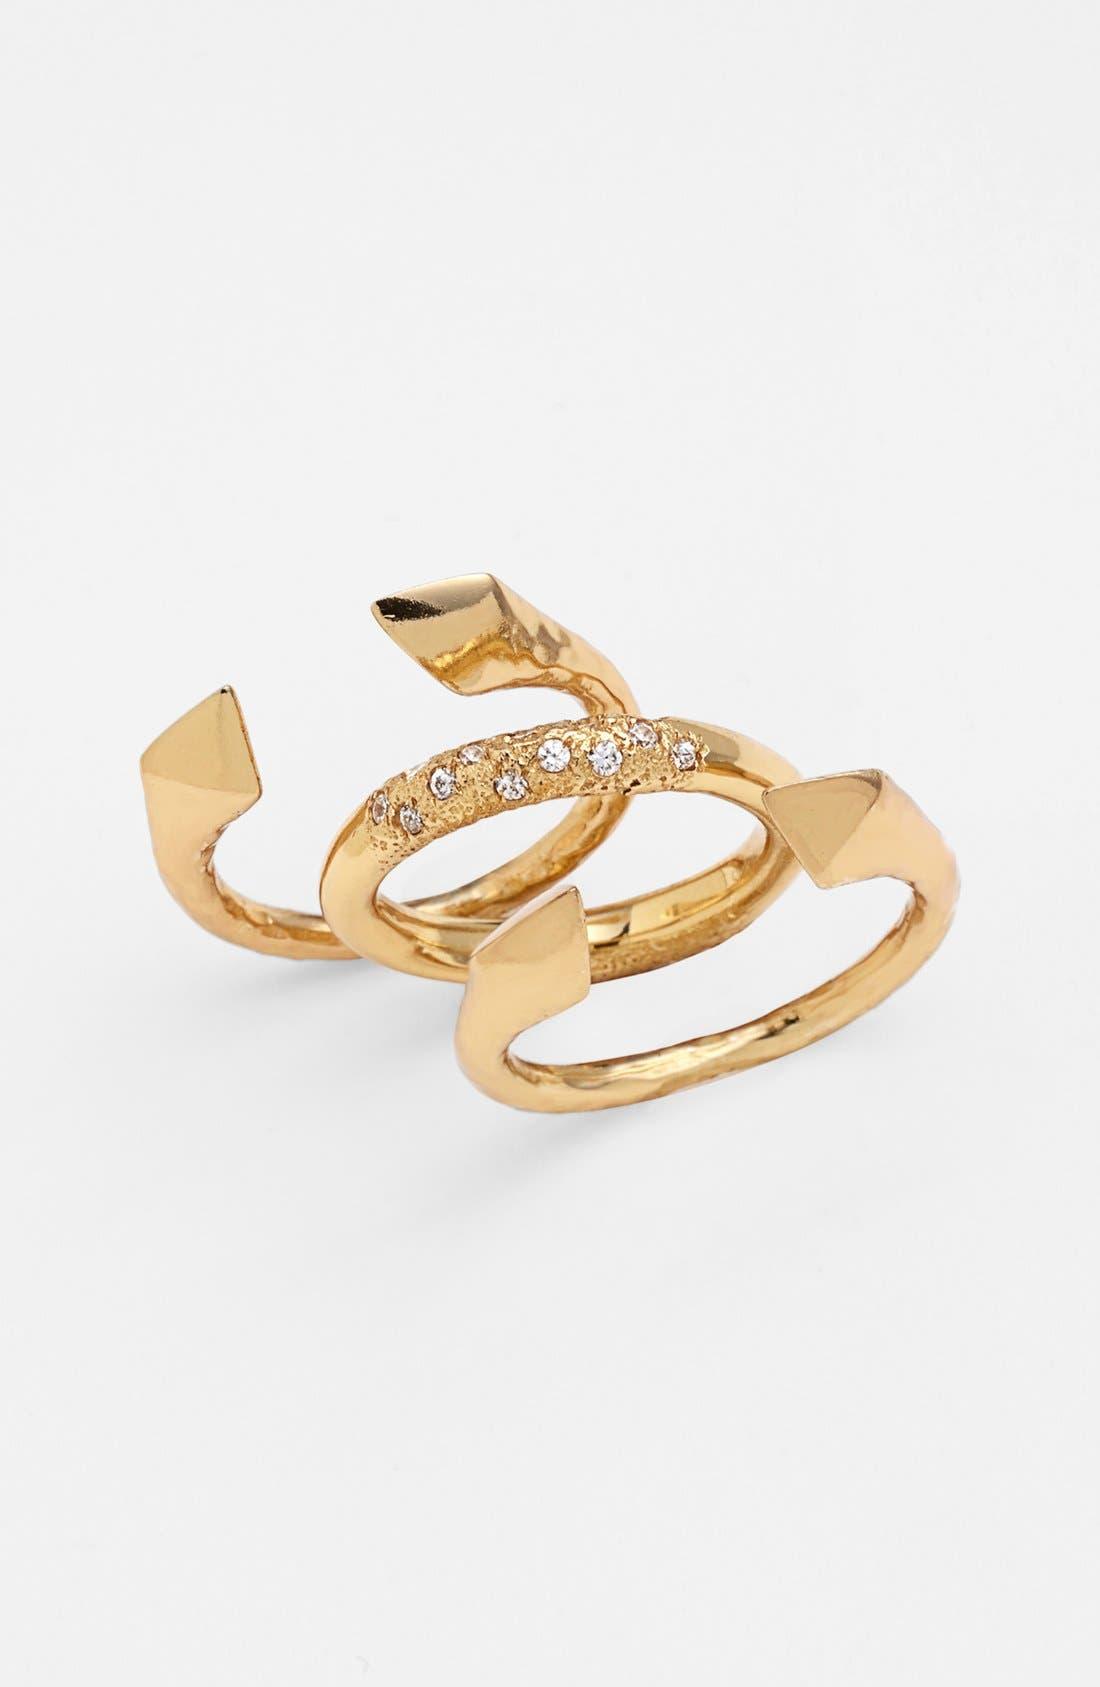 Alternate Image 1 Selected - Melinda Maria 'Nailhead - Harris' Stackable Rings (Set of 3) (Nordstrom Exclusive)